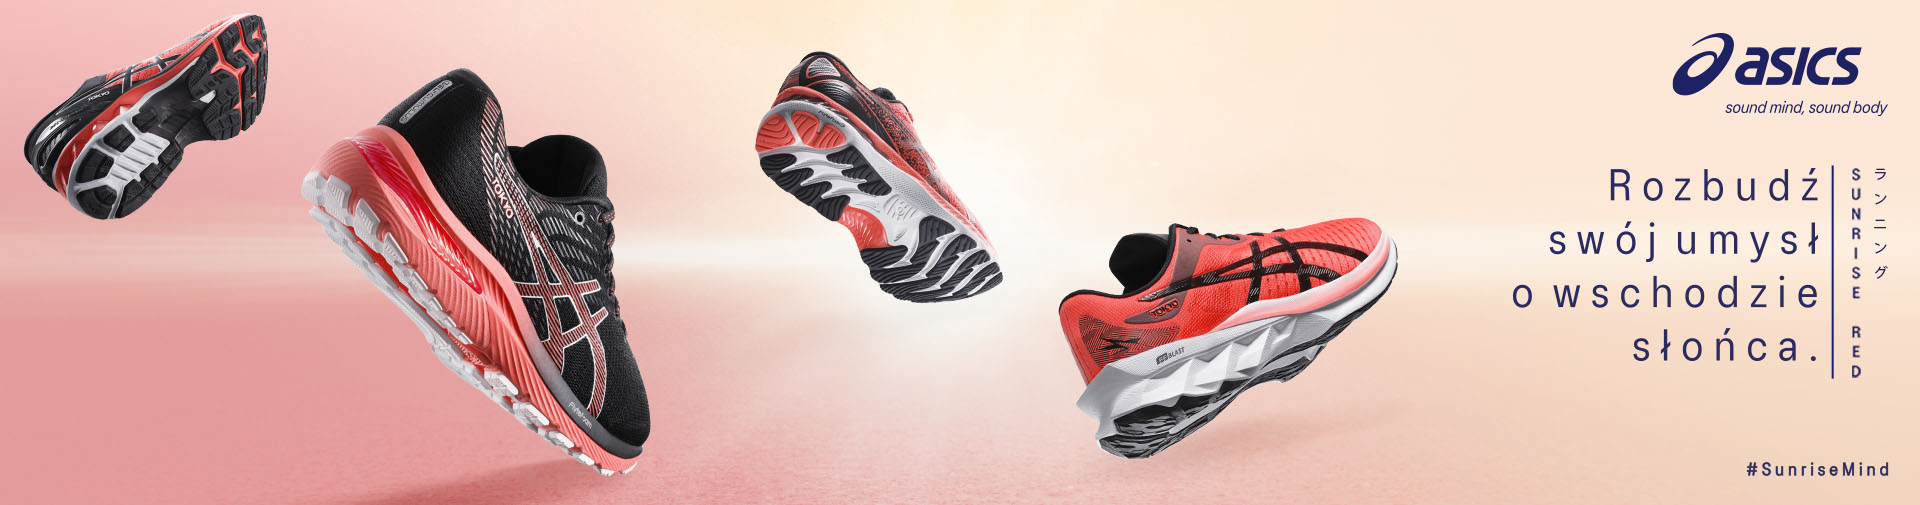 #SunriseMind Kolekcja butów Asics z serii Sunrise. Kolekcja na rok 2021